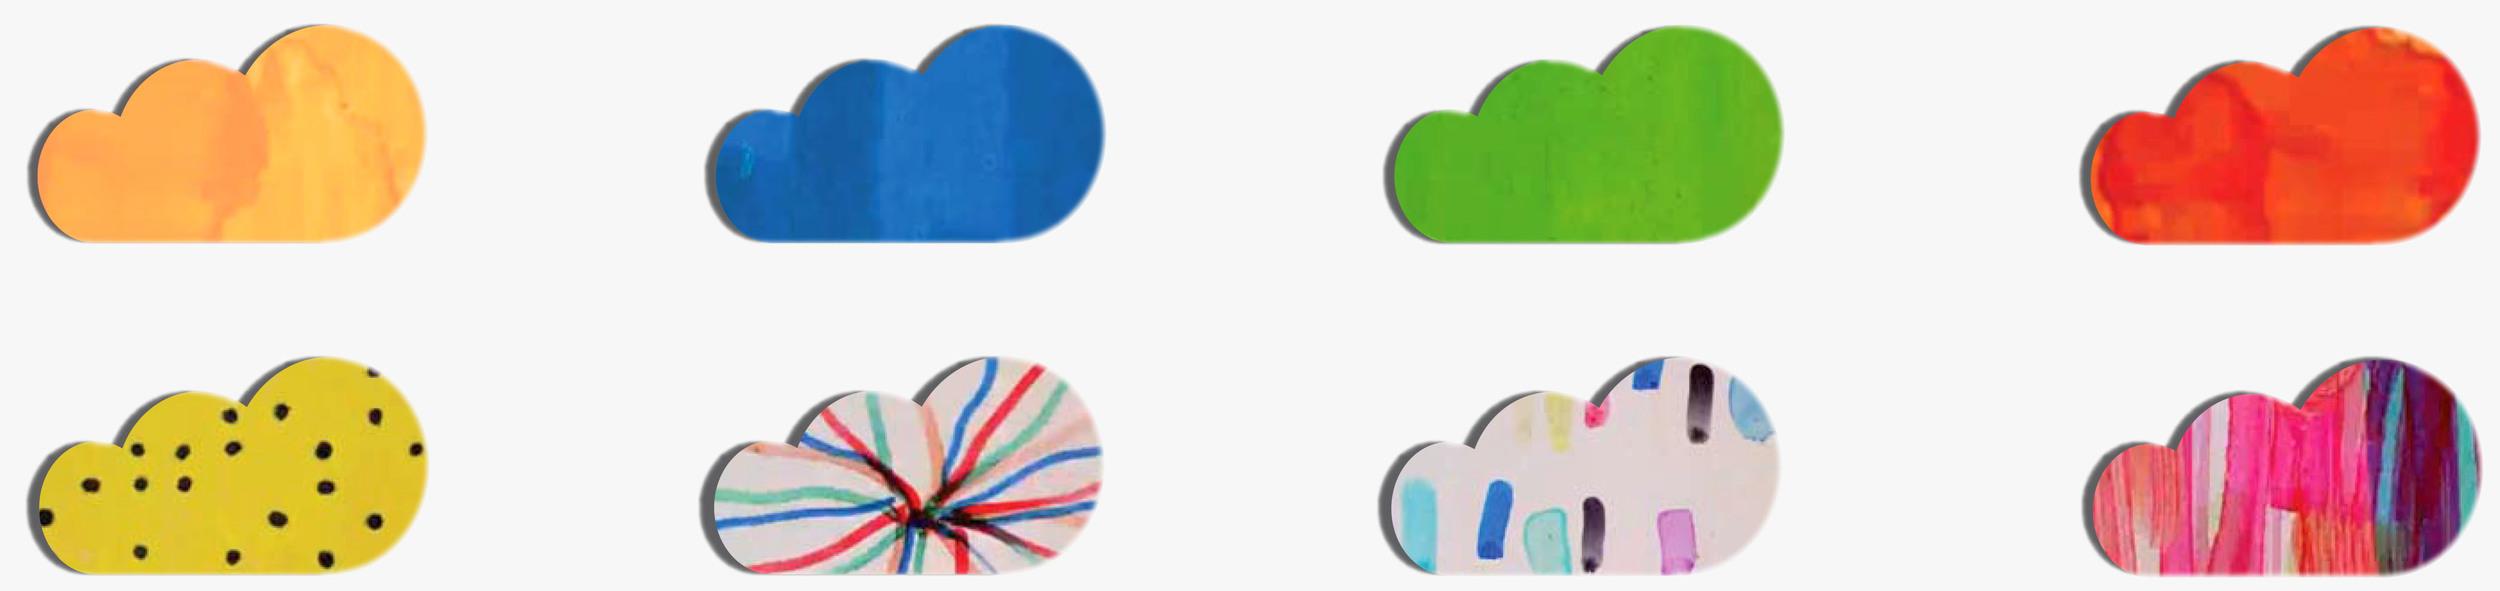 clouds1b.jpg